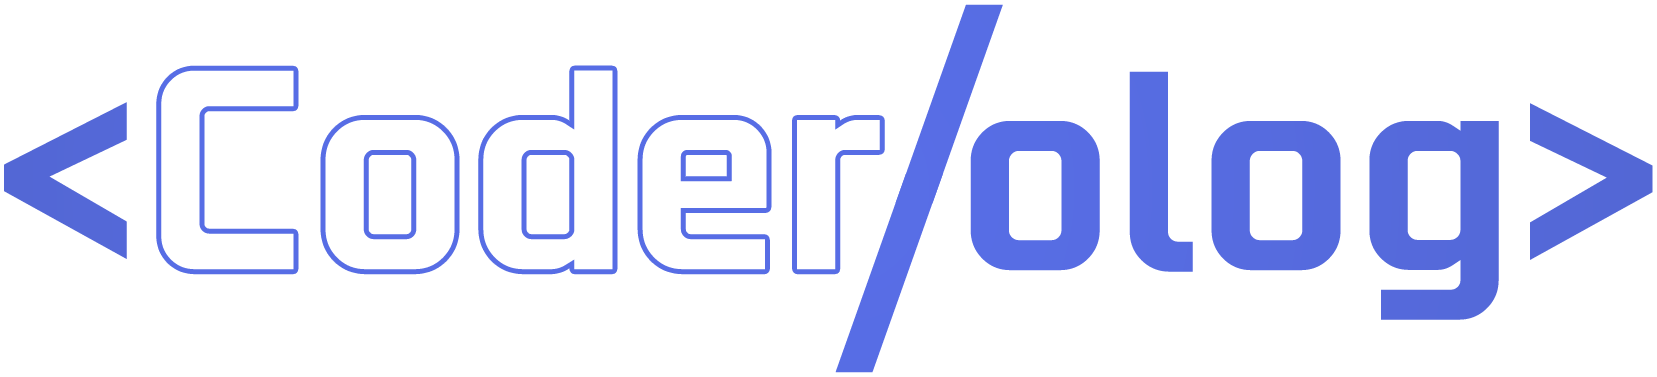 Coderolog